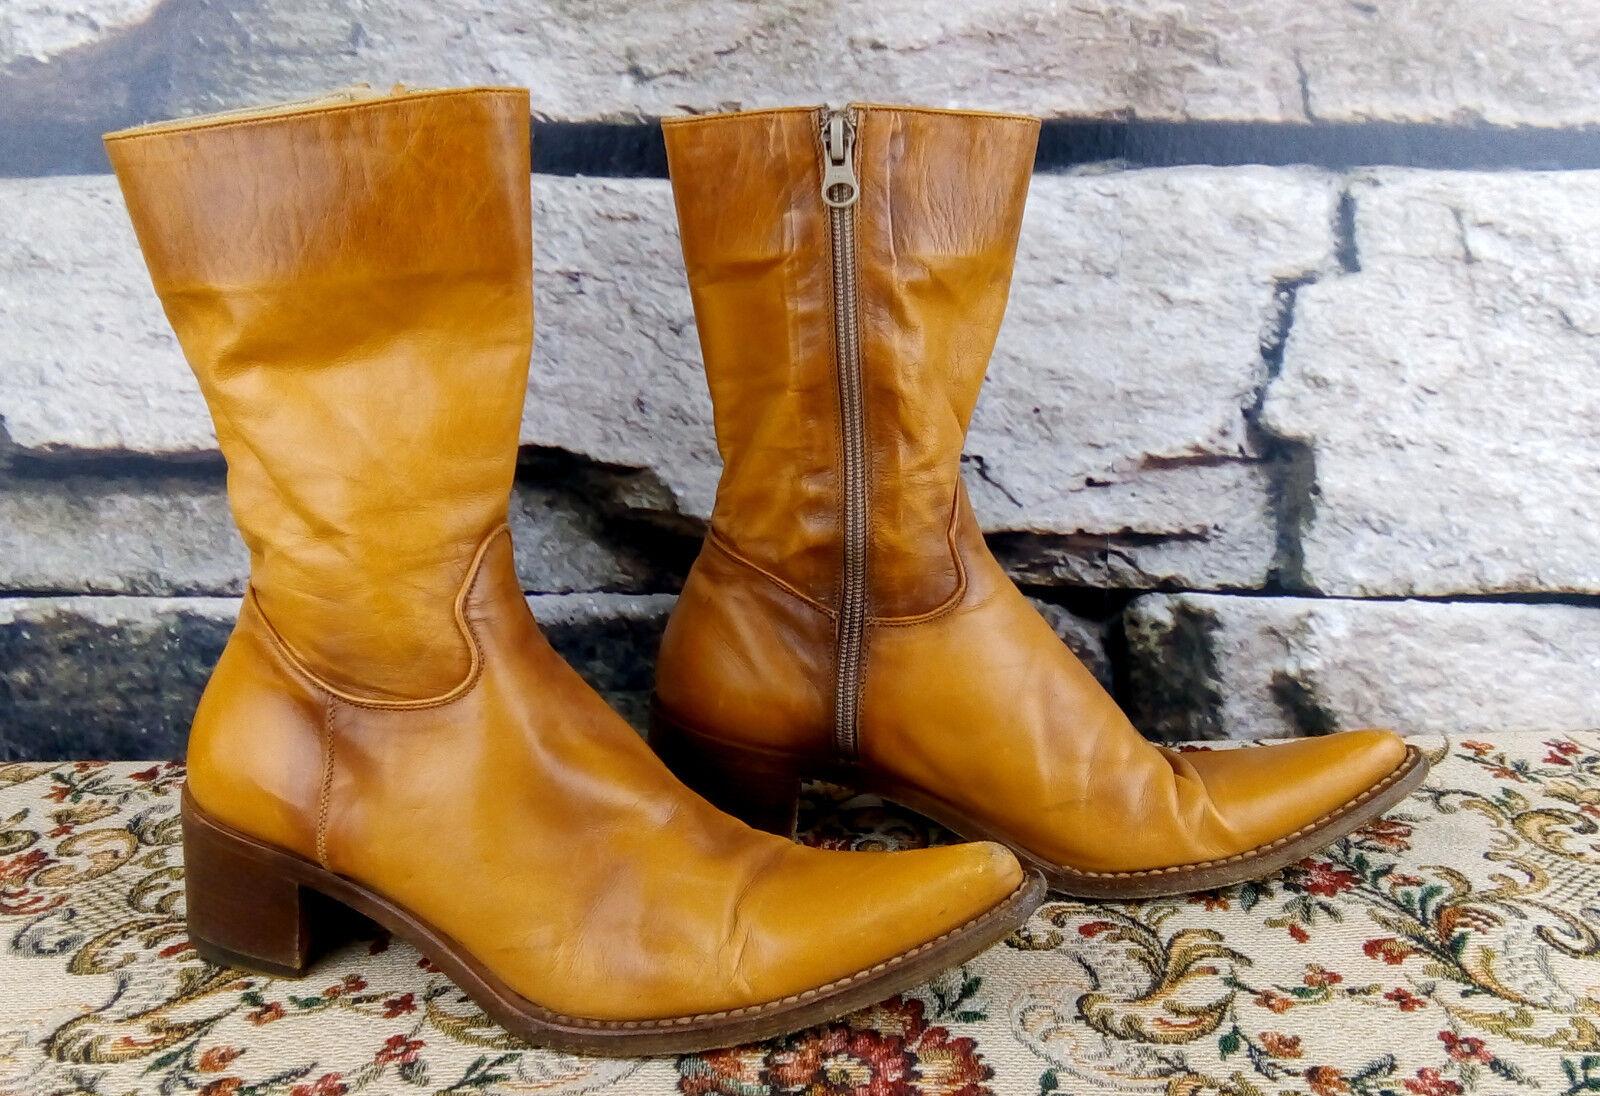 Rocco p. rahmengenähte botas de cuero Western Cowboy botas line Dance  e2